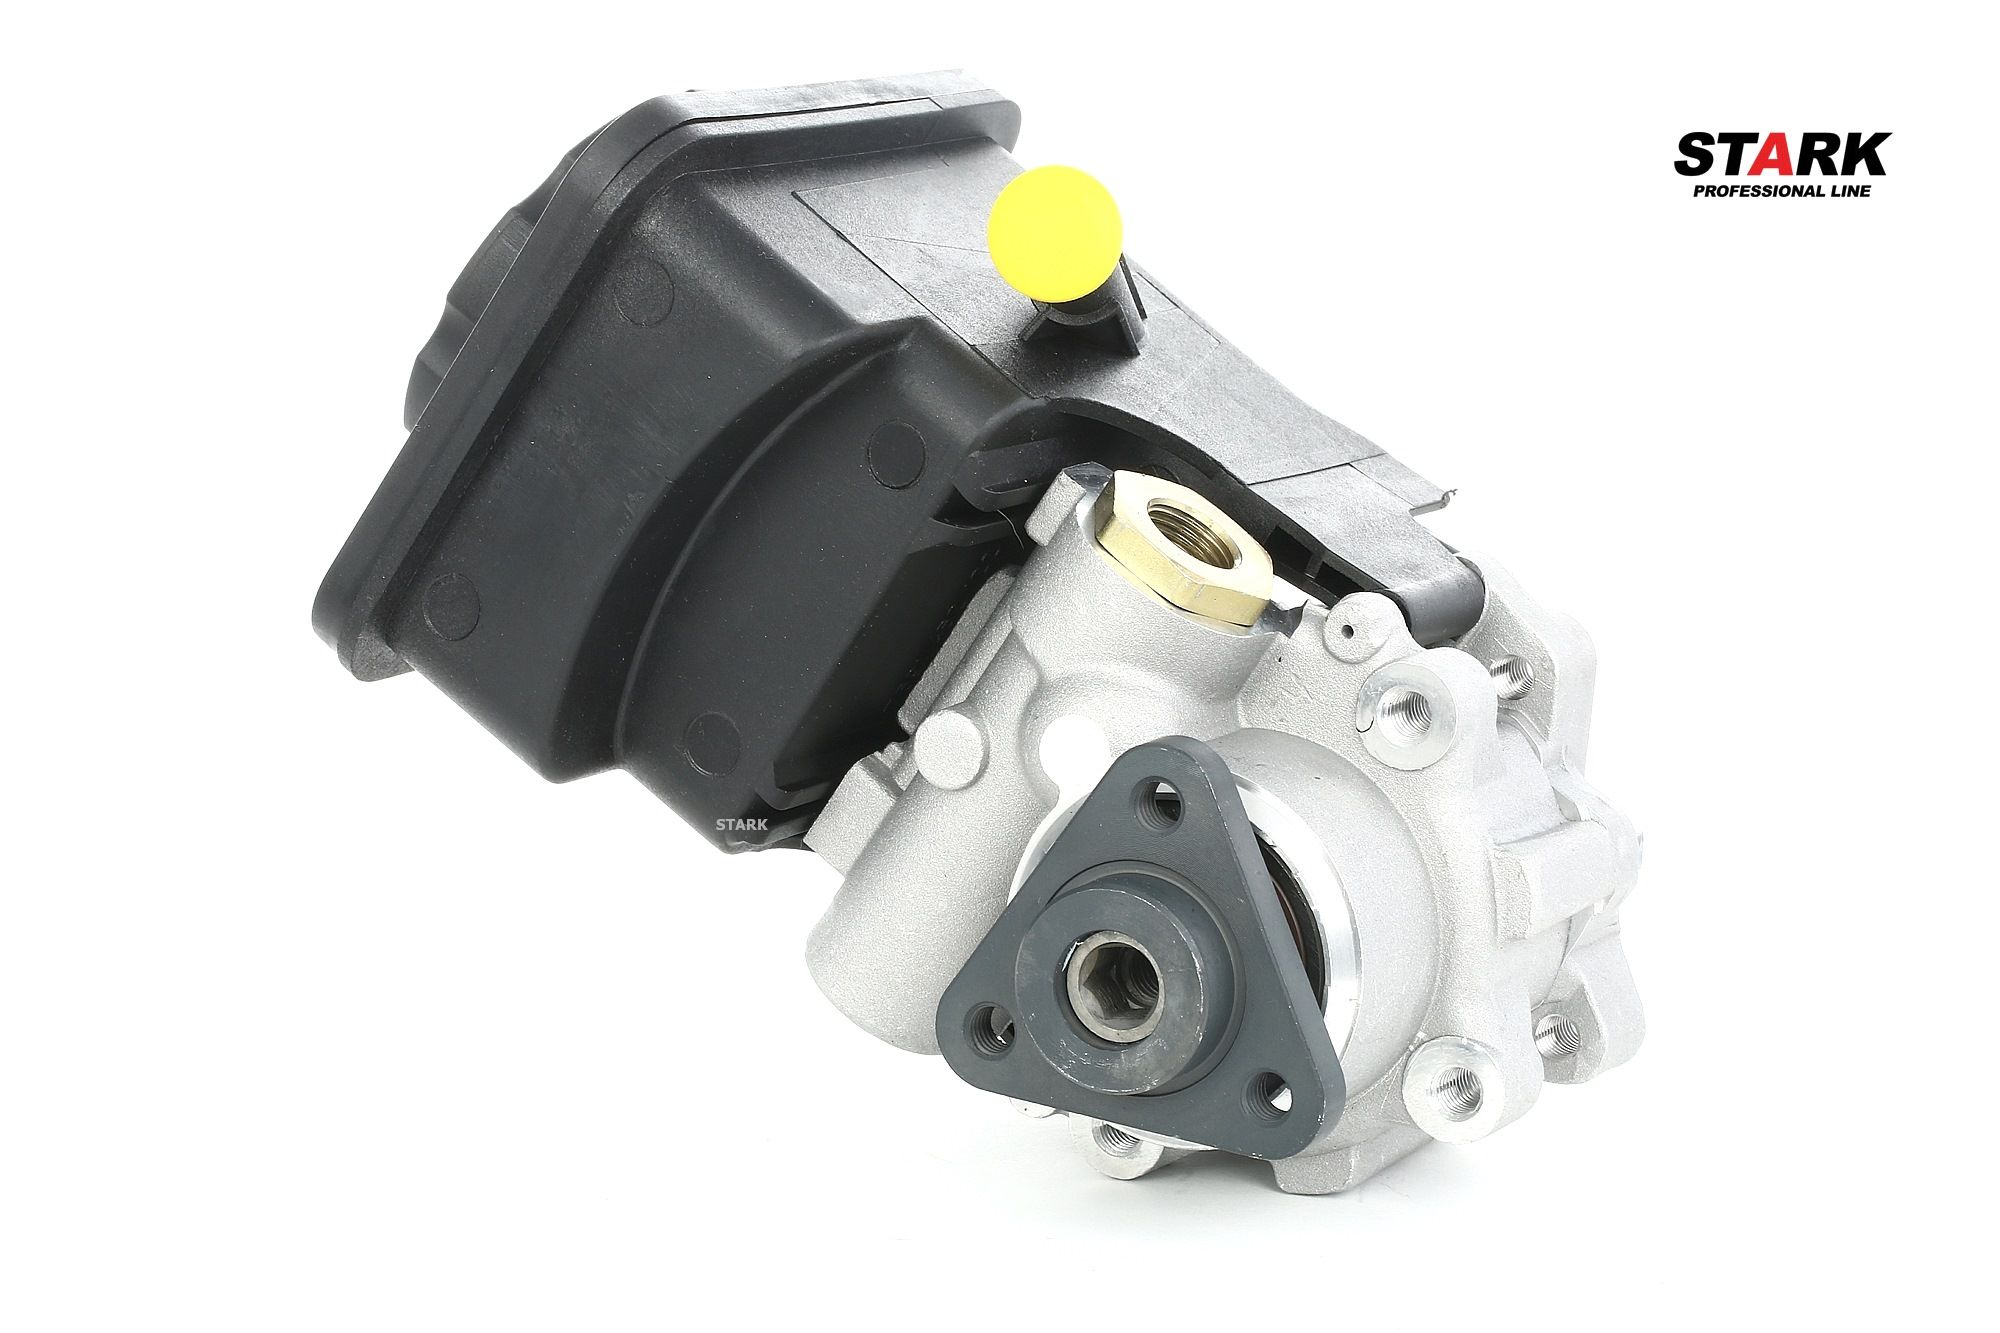 Servo pump STARK SKHP-0540022 rating